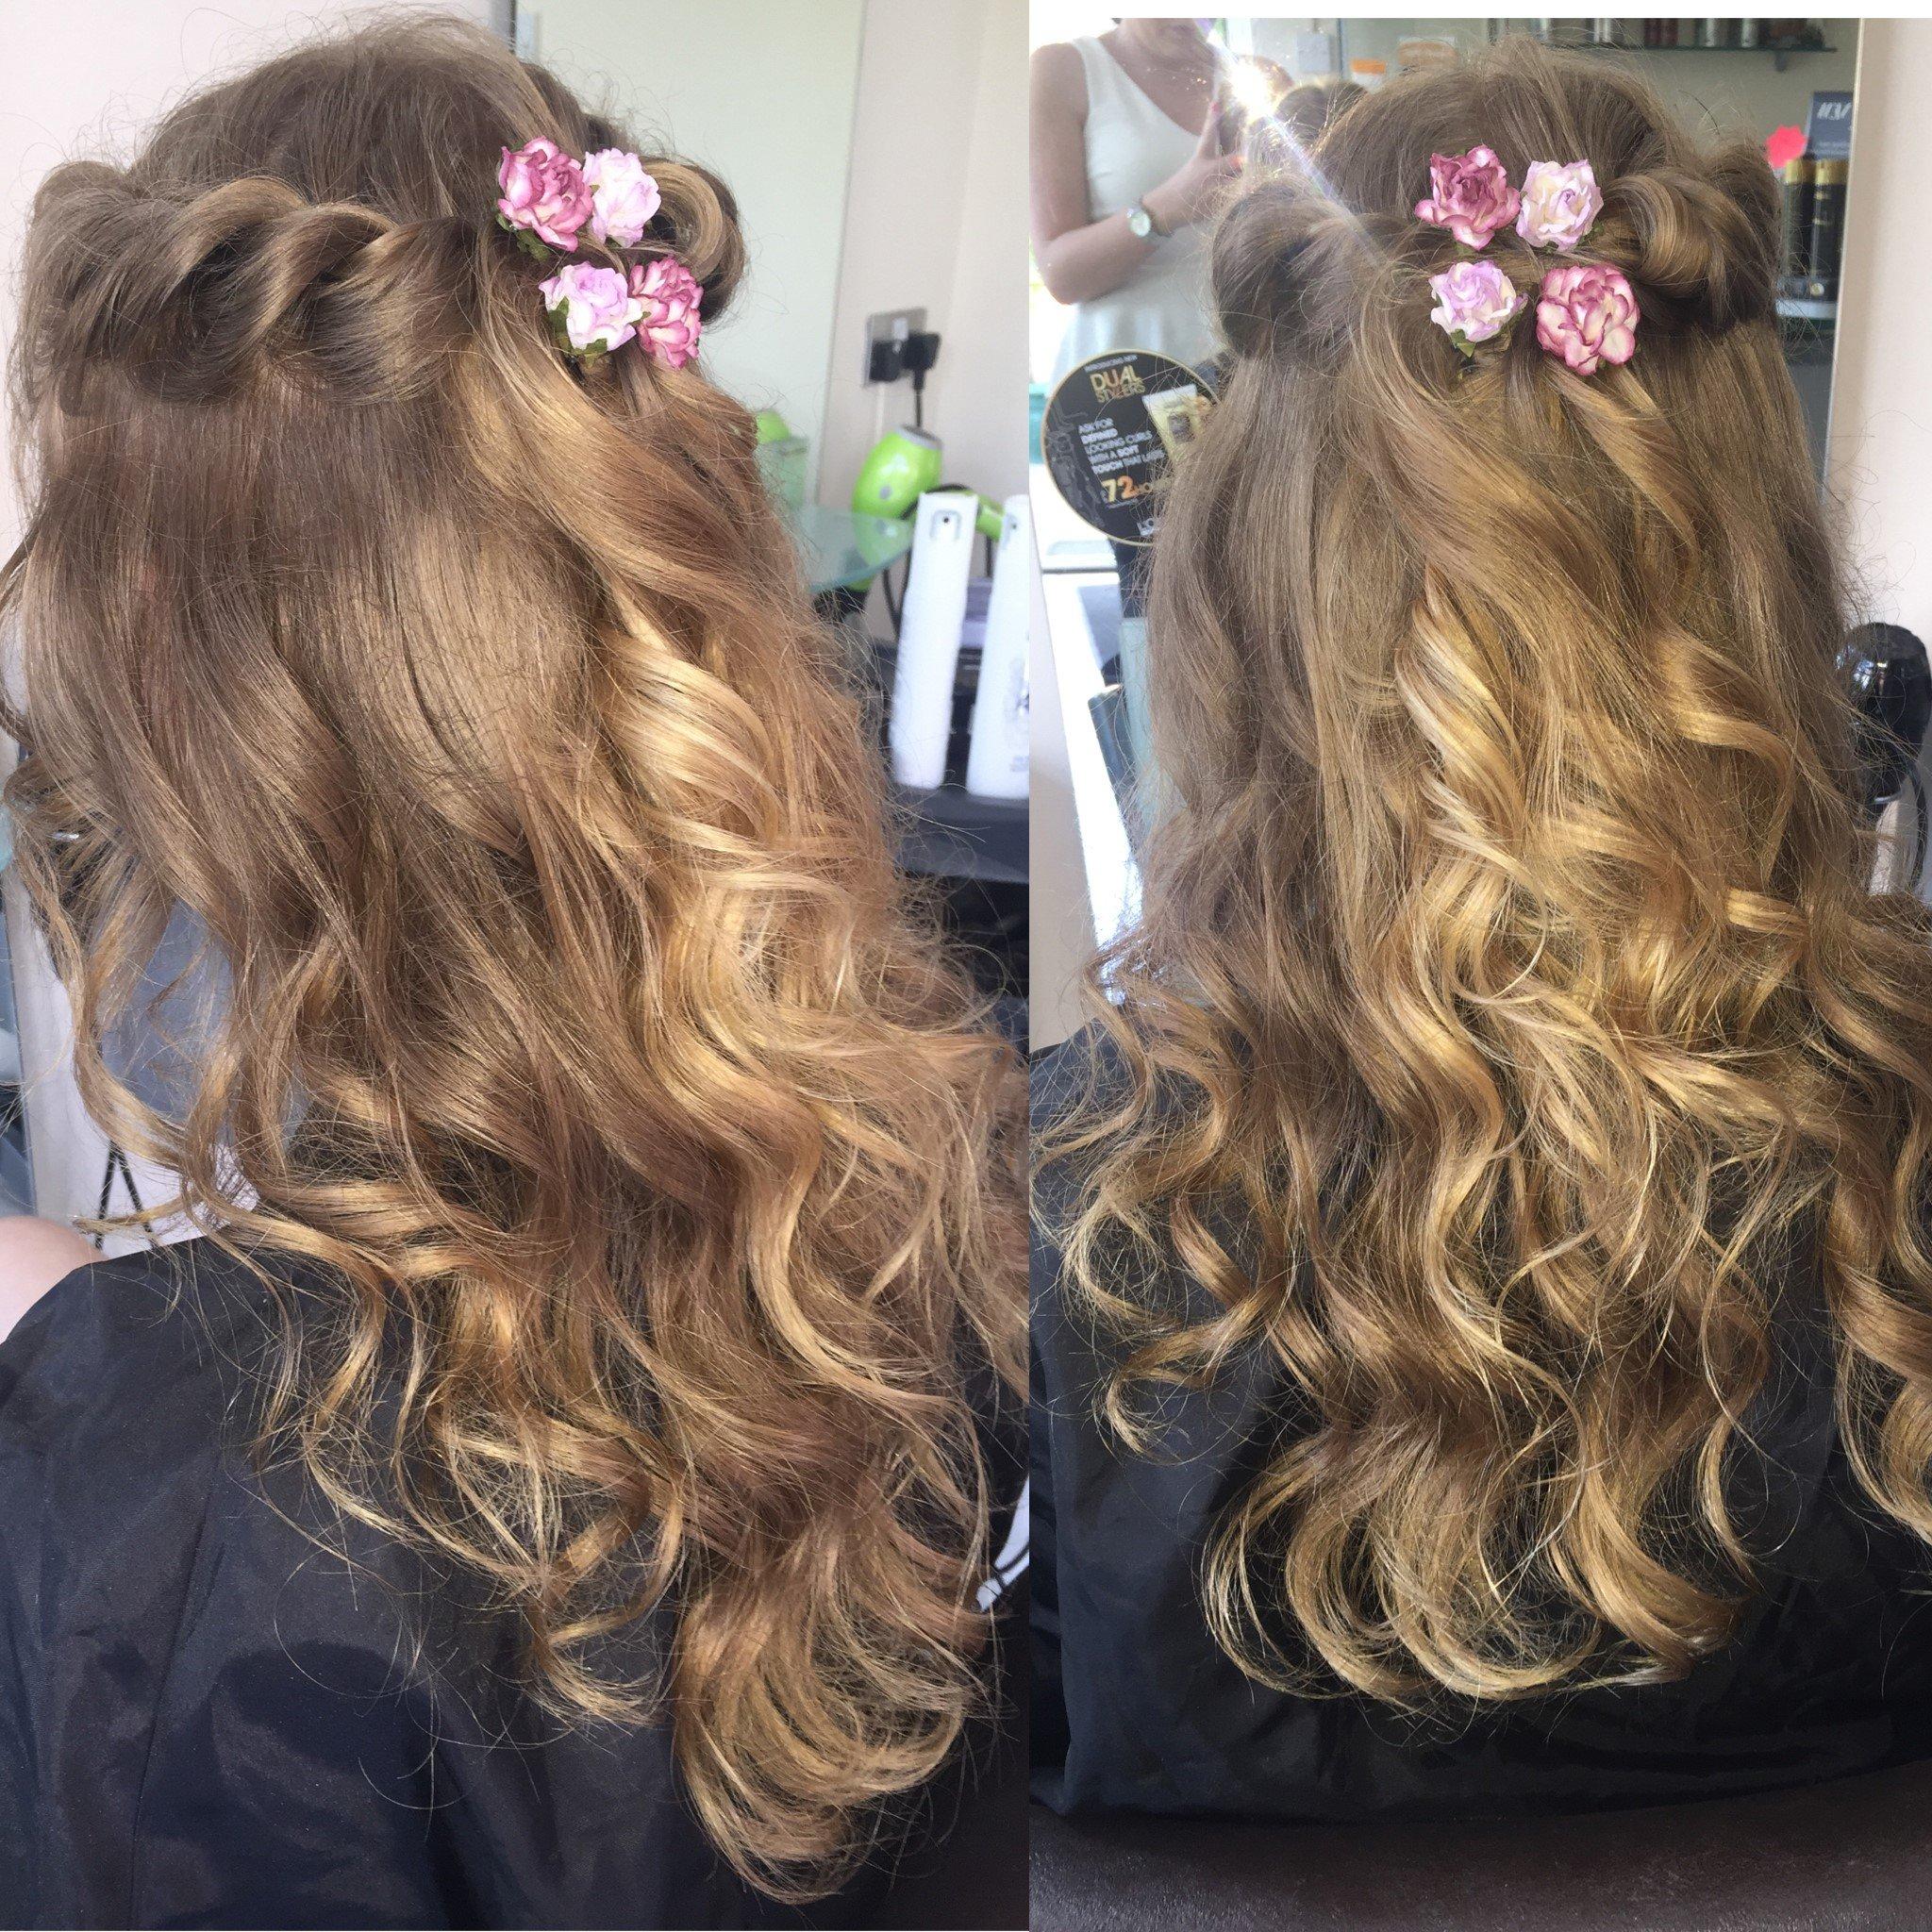 Floral hair decoration